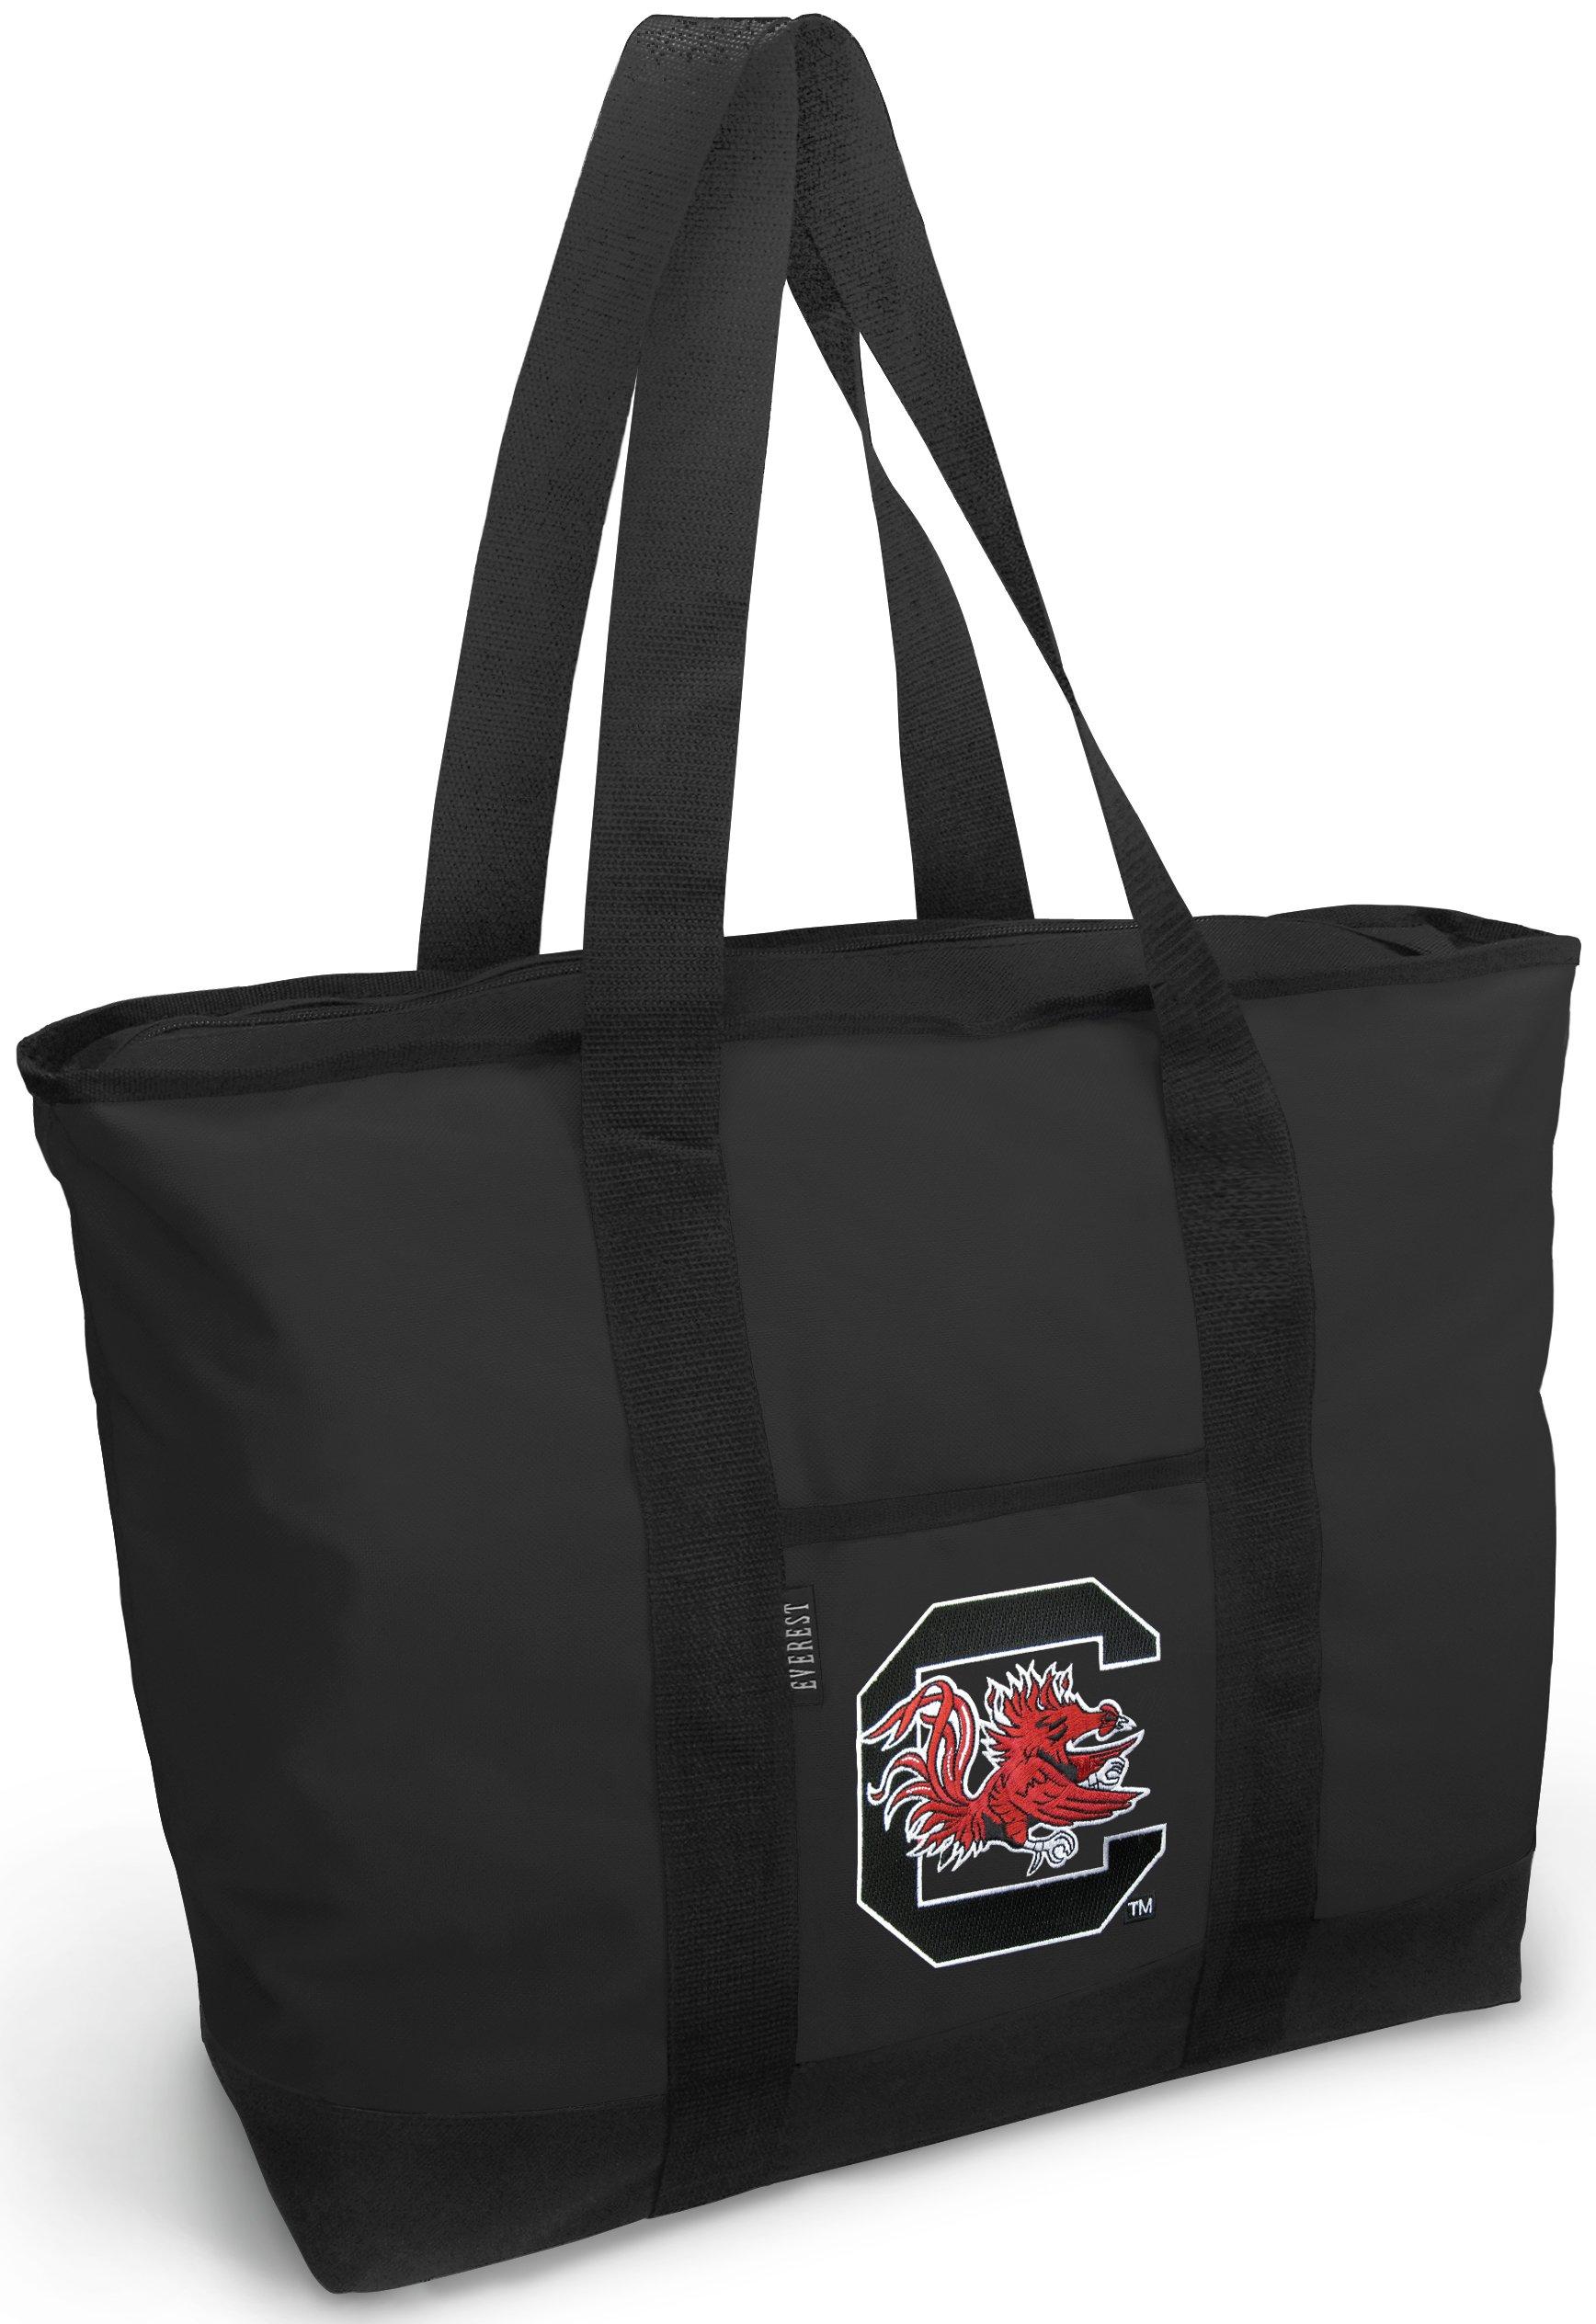 University of South Carolina Tote Bag Best South Carolina Gamecocks Totes SHOPPING TRAVEL or EVERYDAY